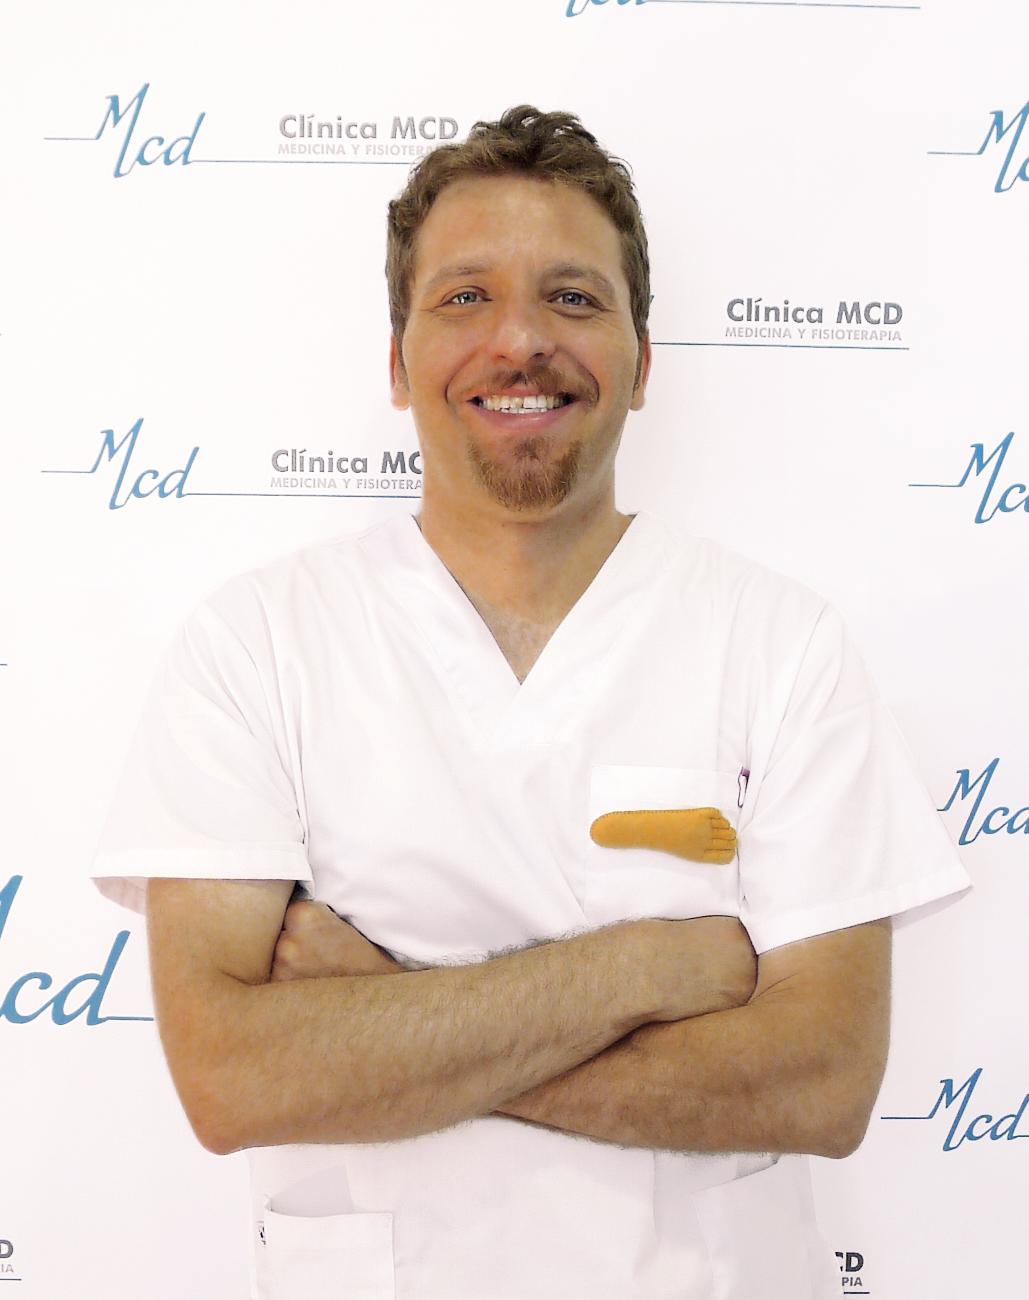 Jonathan Mújica Pérez